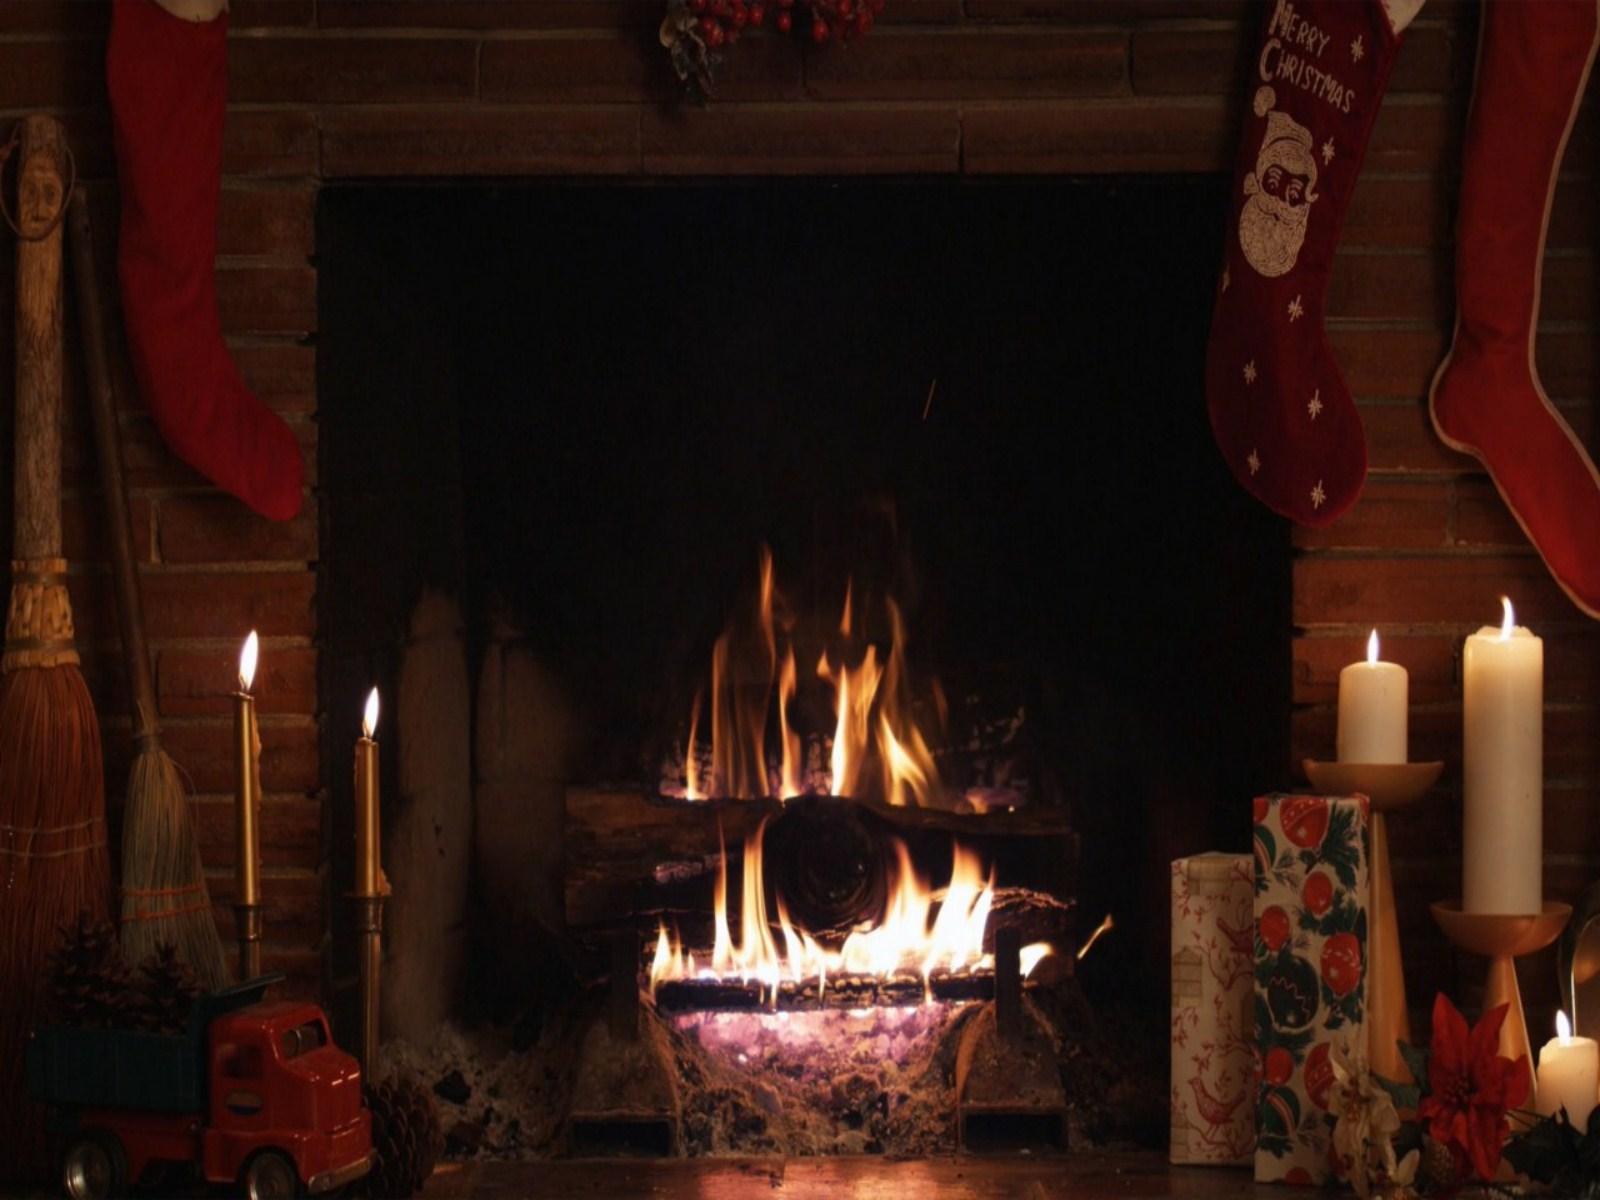 Christmas Fireplace Wallpaper   1600x1200   220604 1600x1200